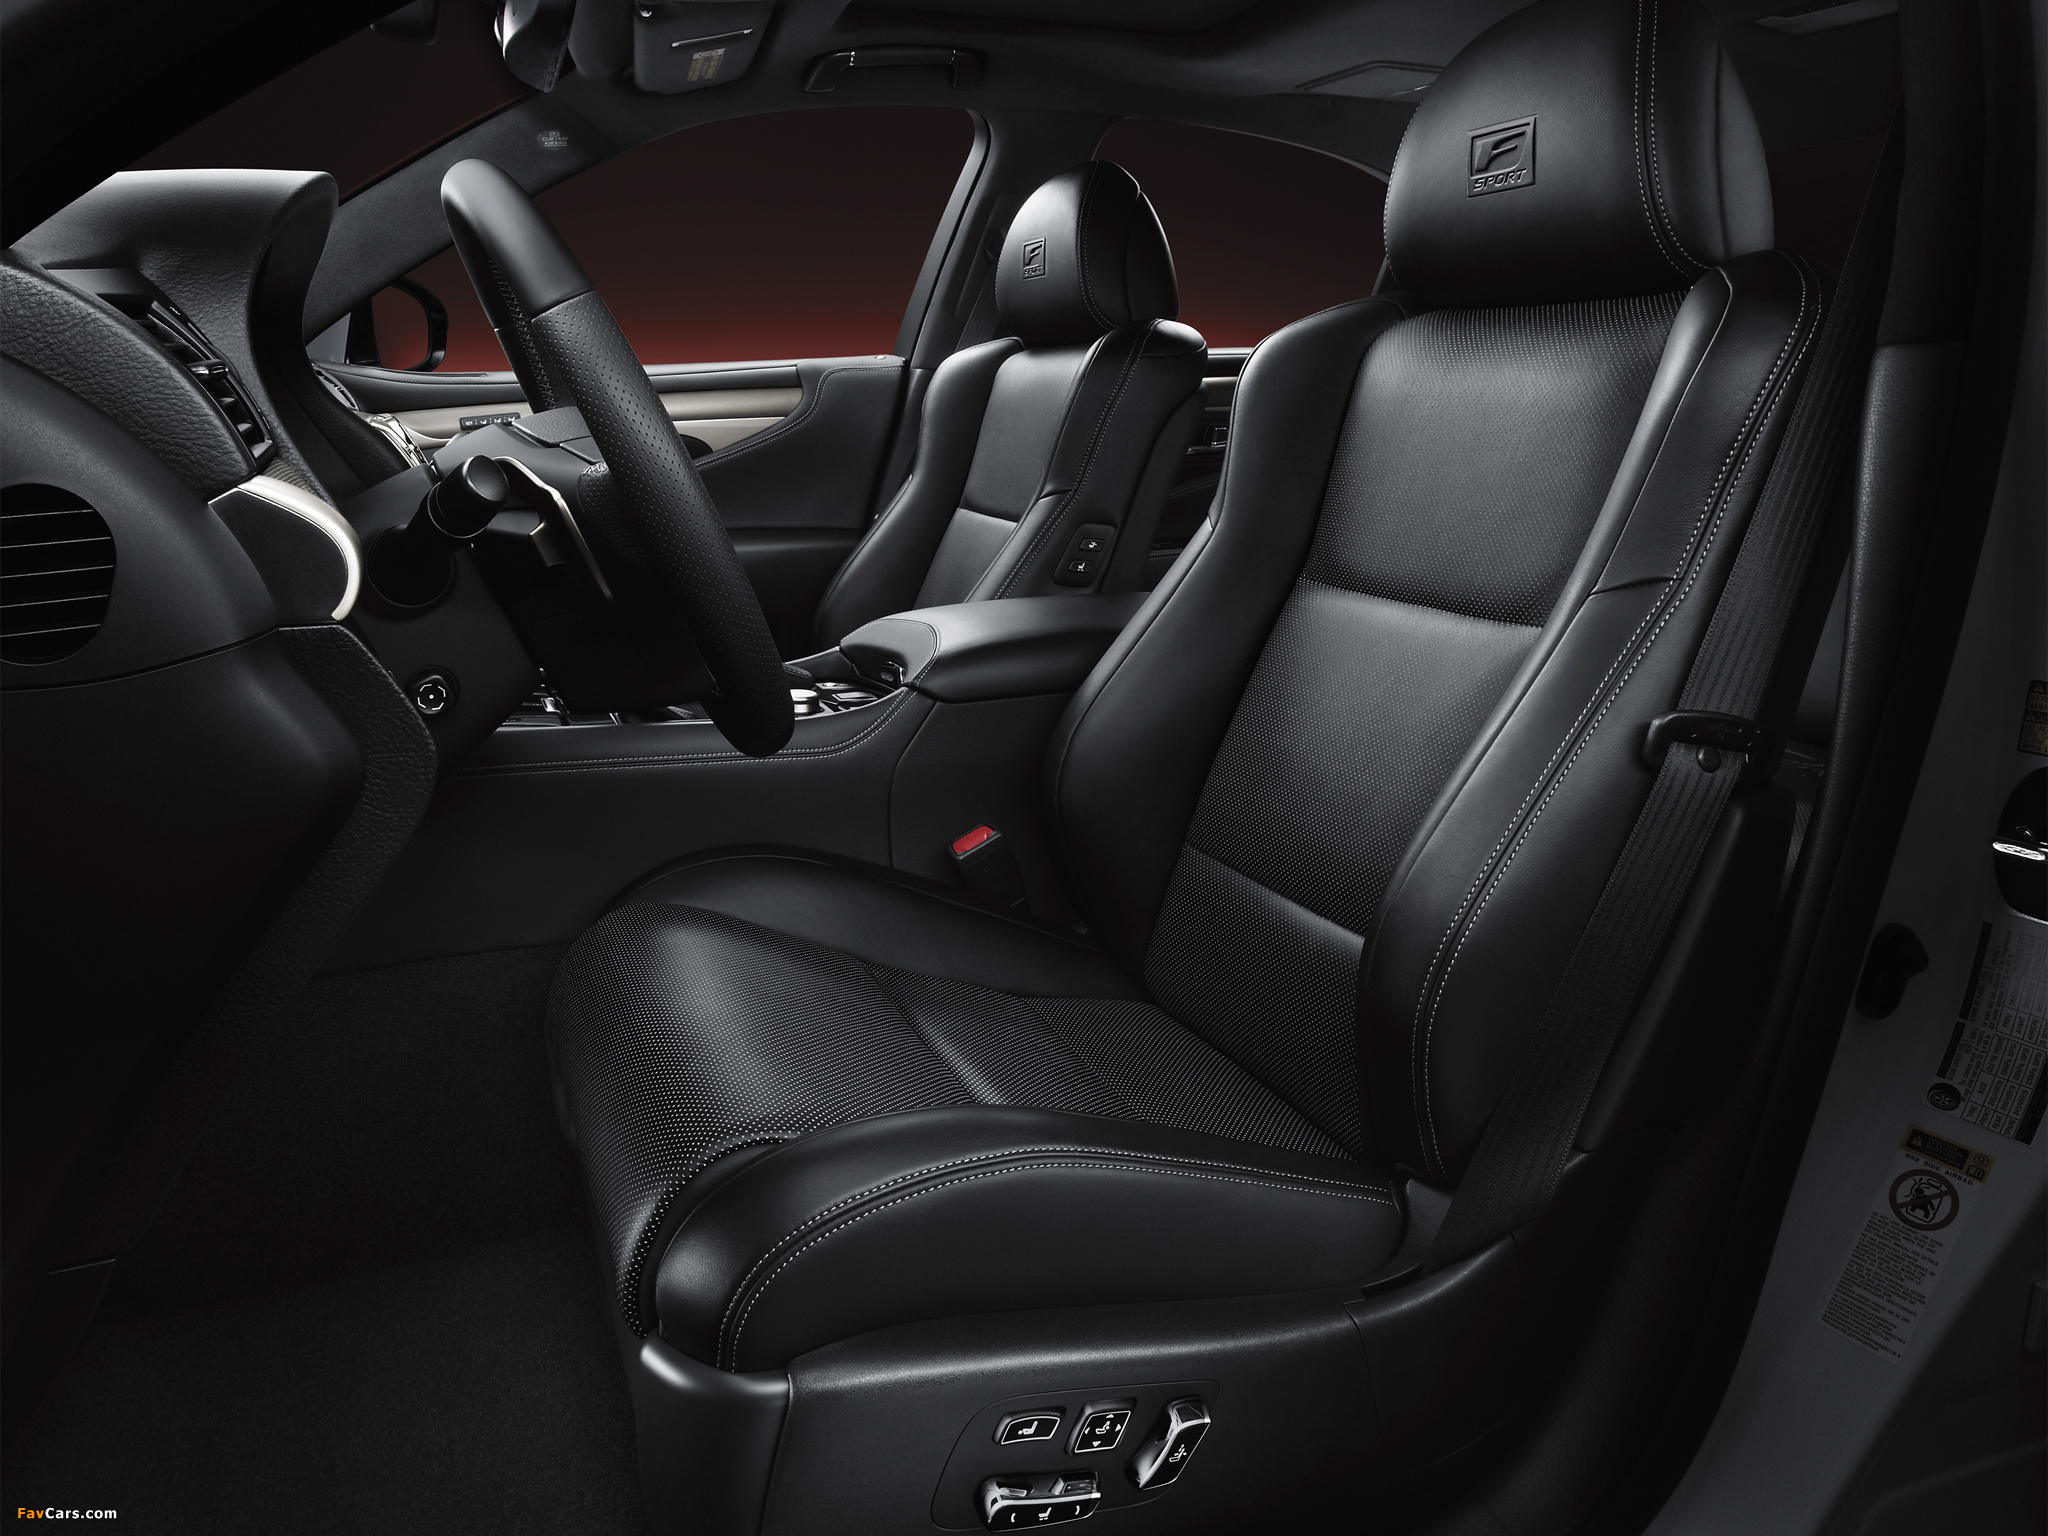 Lexus LS 460 F-Sport 2012 images (2048 x 1536)